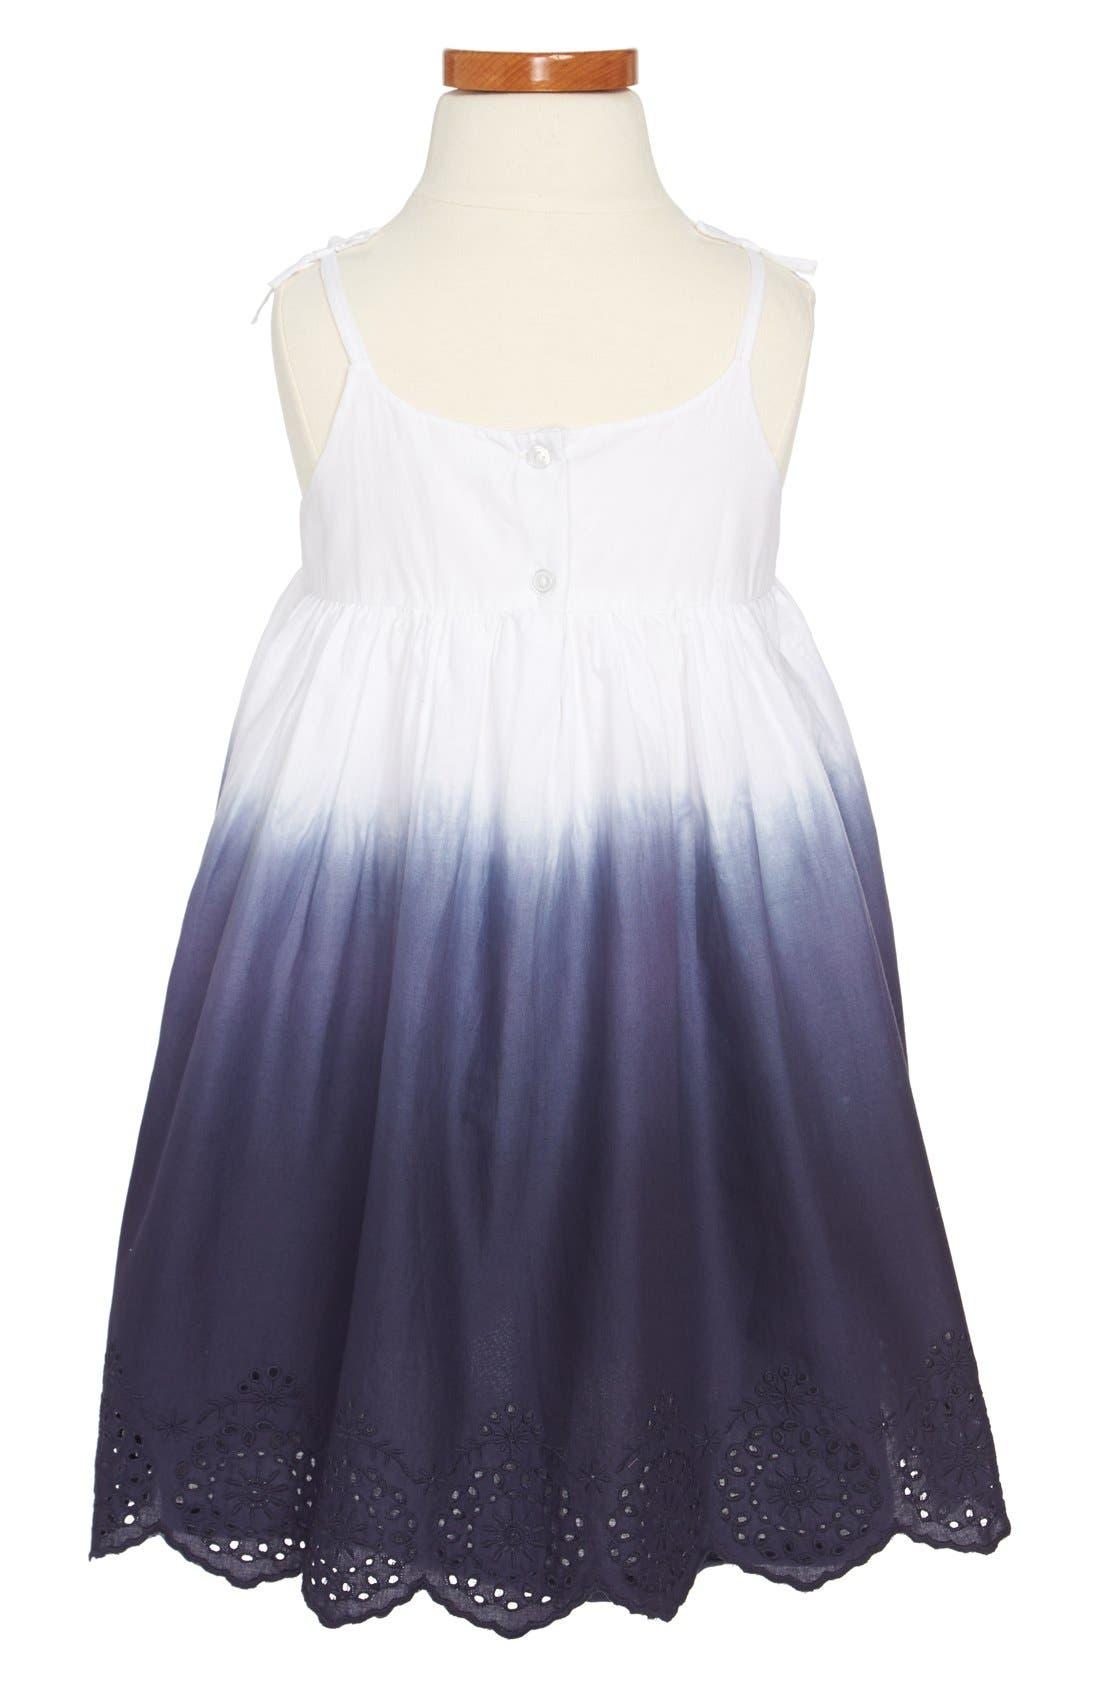 Alternate Image 2  - Tucker + Tate 'Maya' Sleeveless Dress (Toddler Girls, Little Girls & Big Girls)